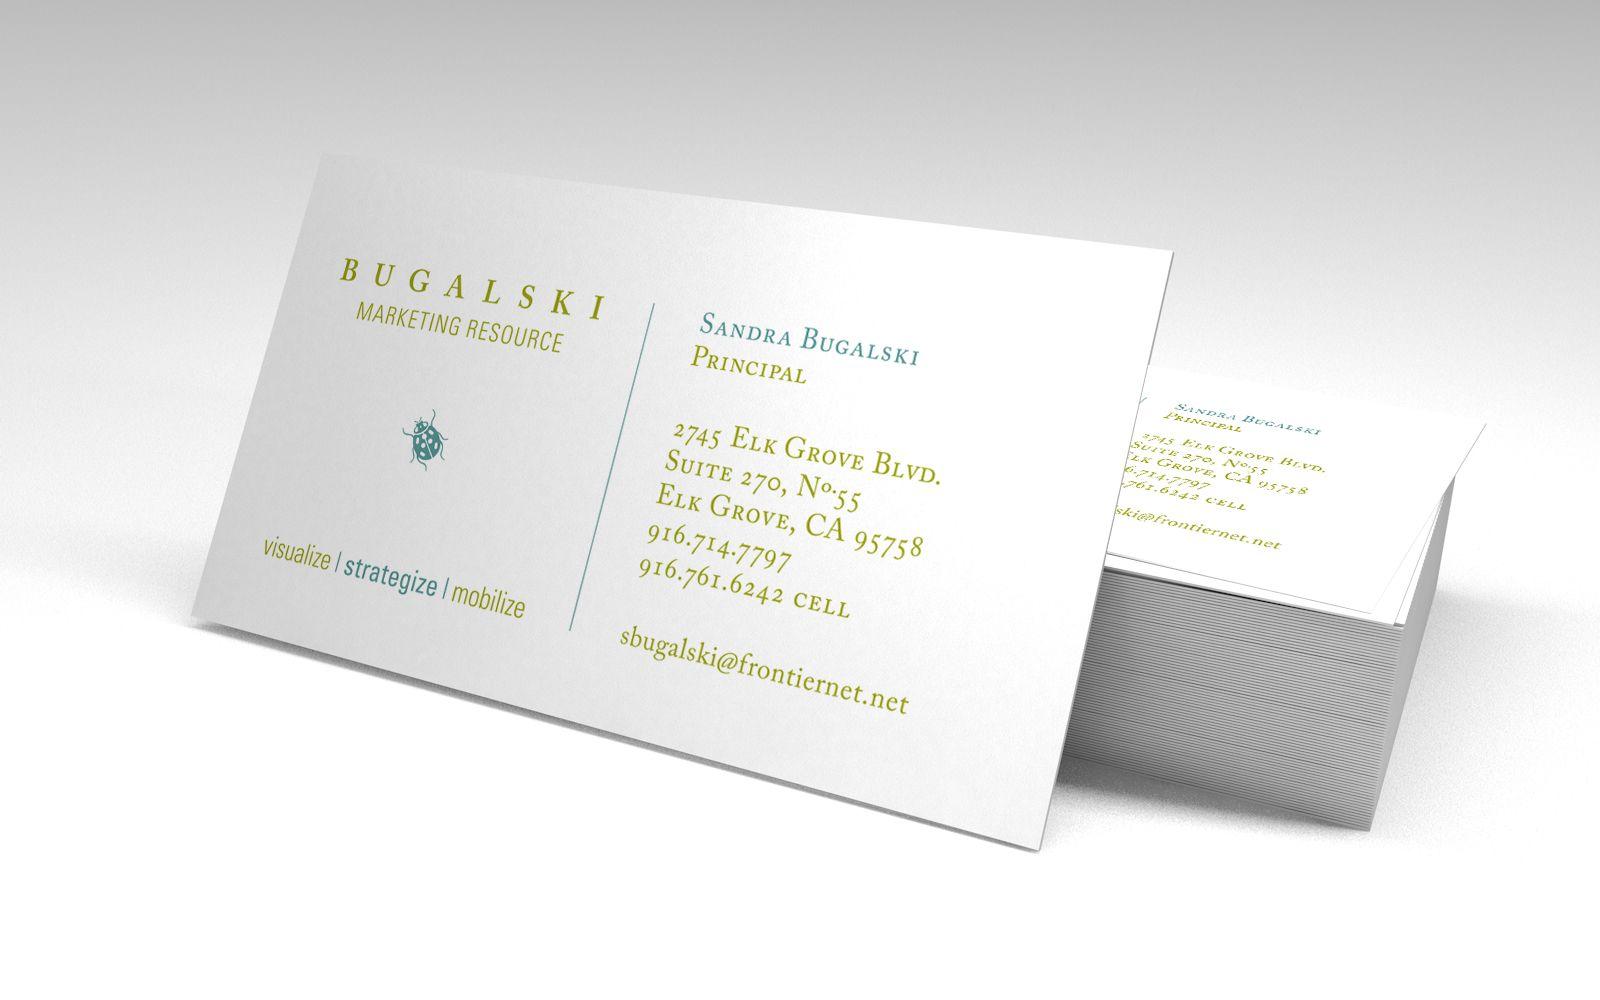 Bugalski Marketing Resource icon and business card design ...